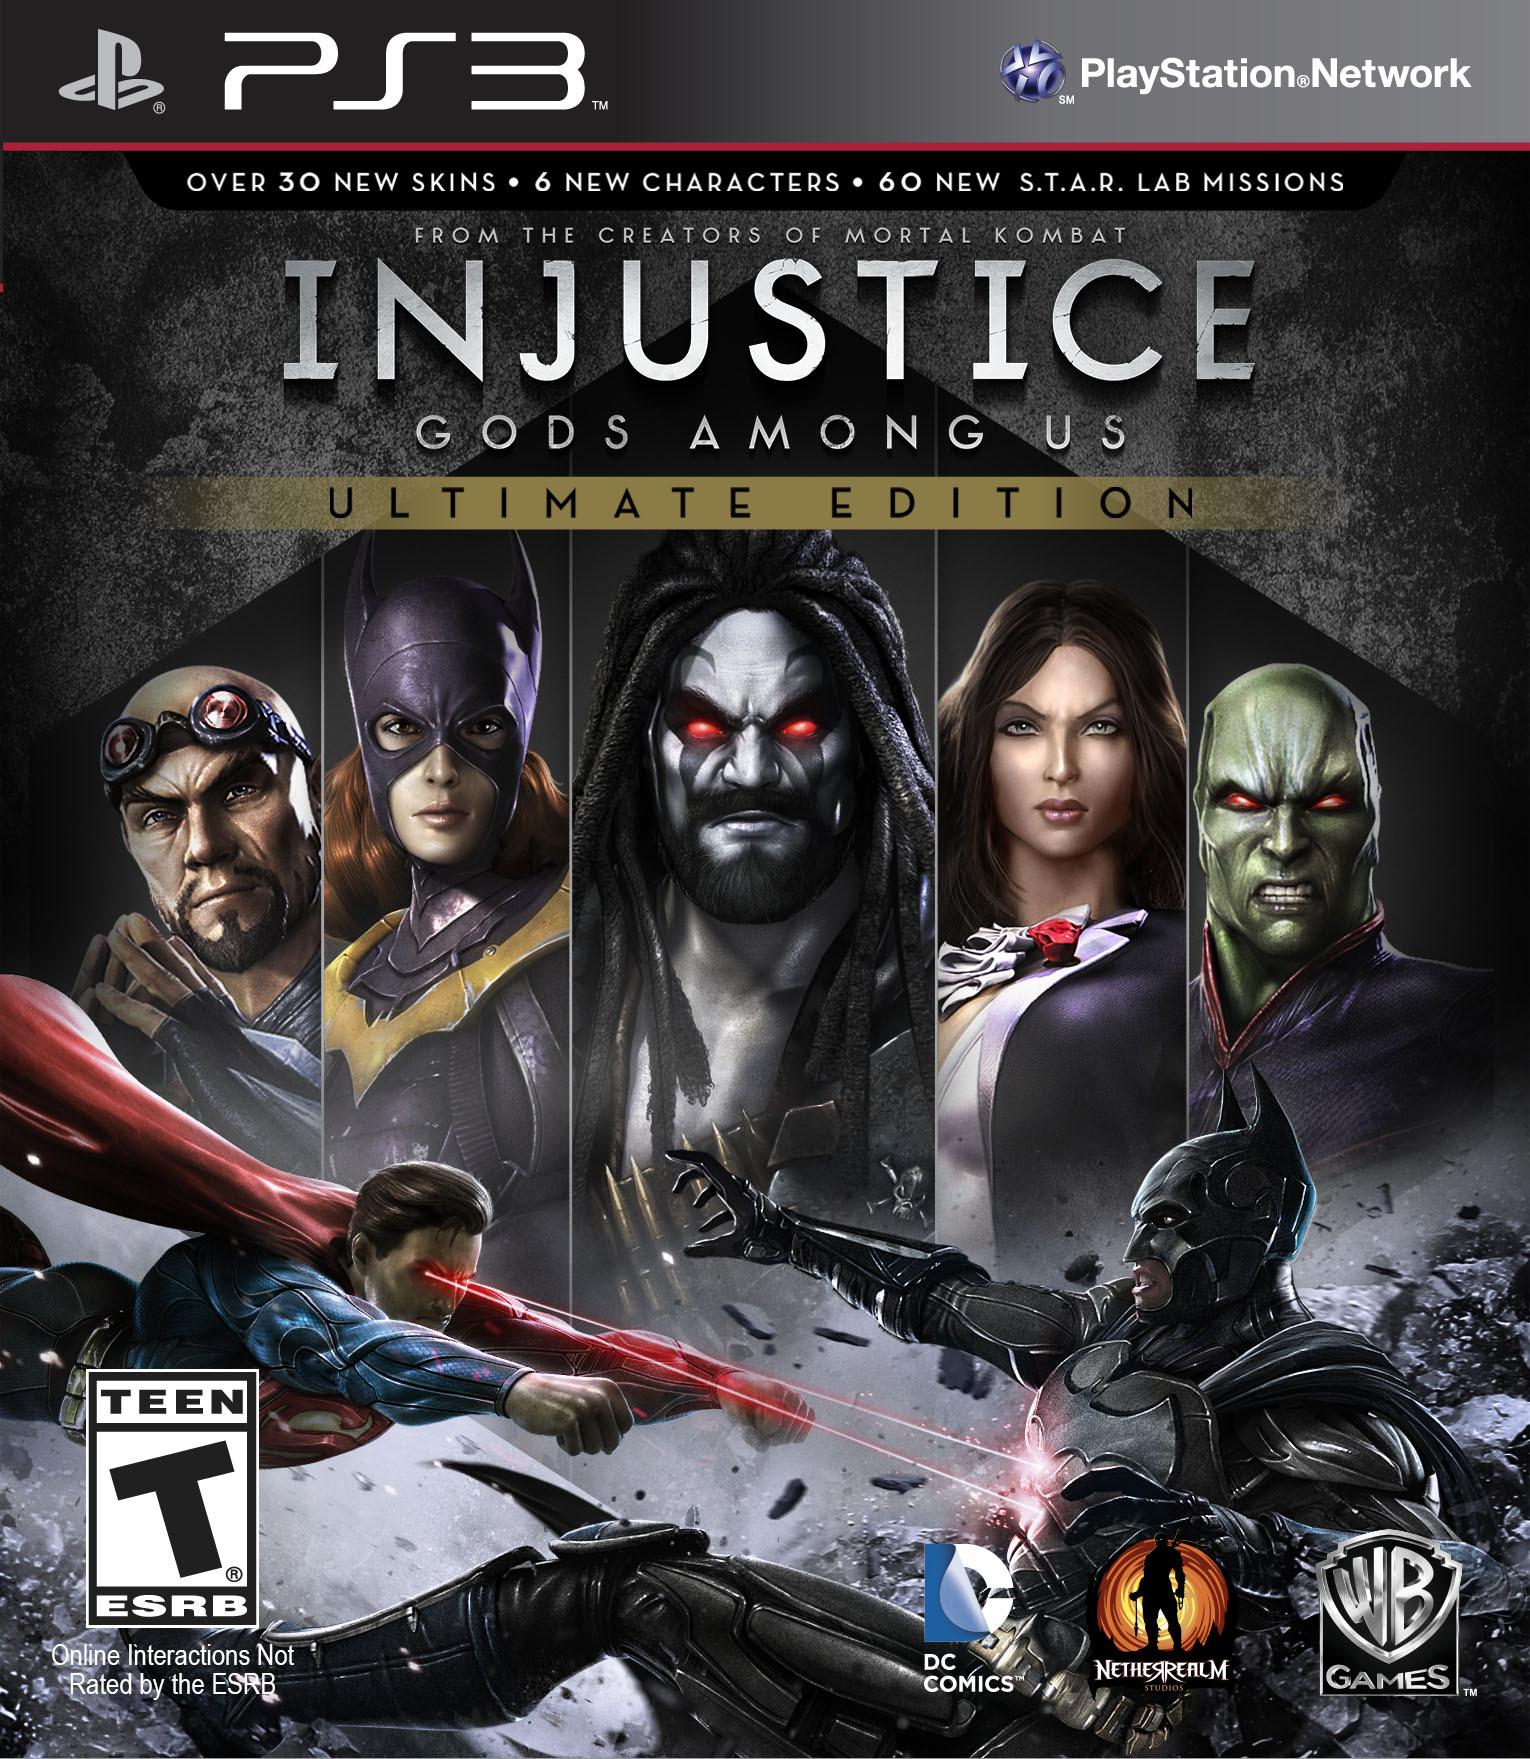 ps3_injustice_gods_among_ult_p_szvfq3.jp